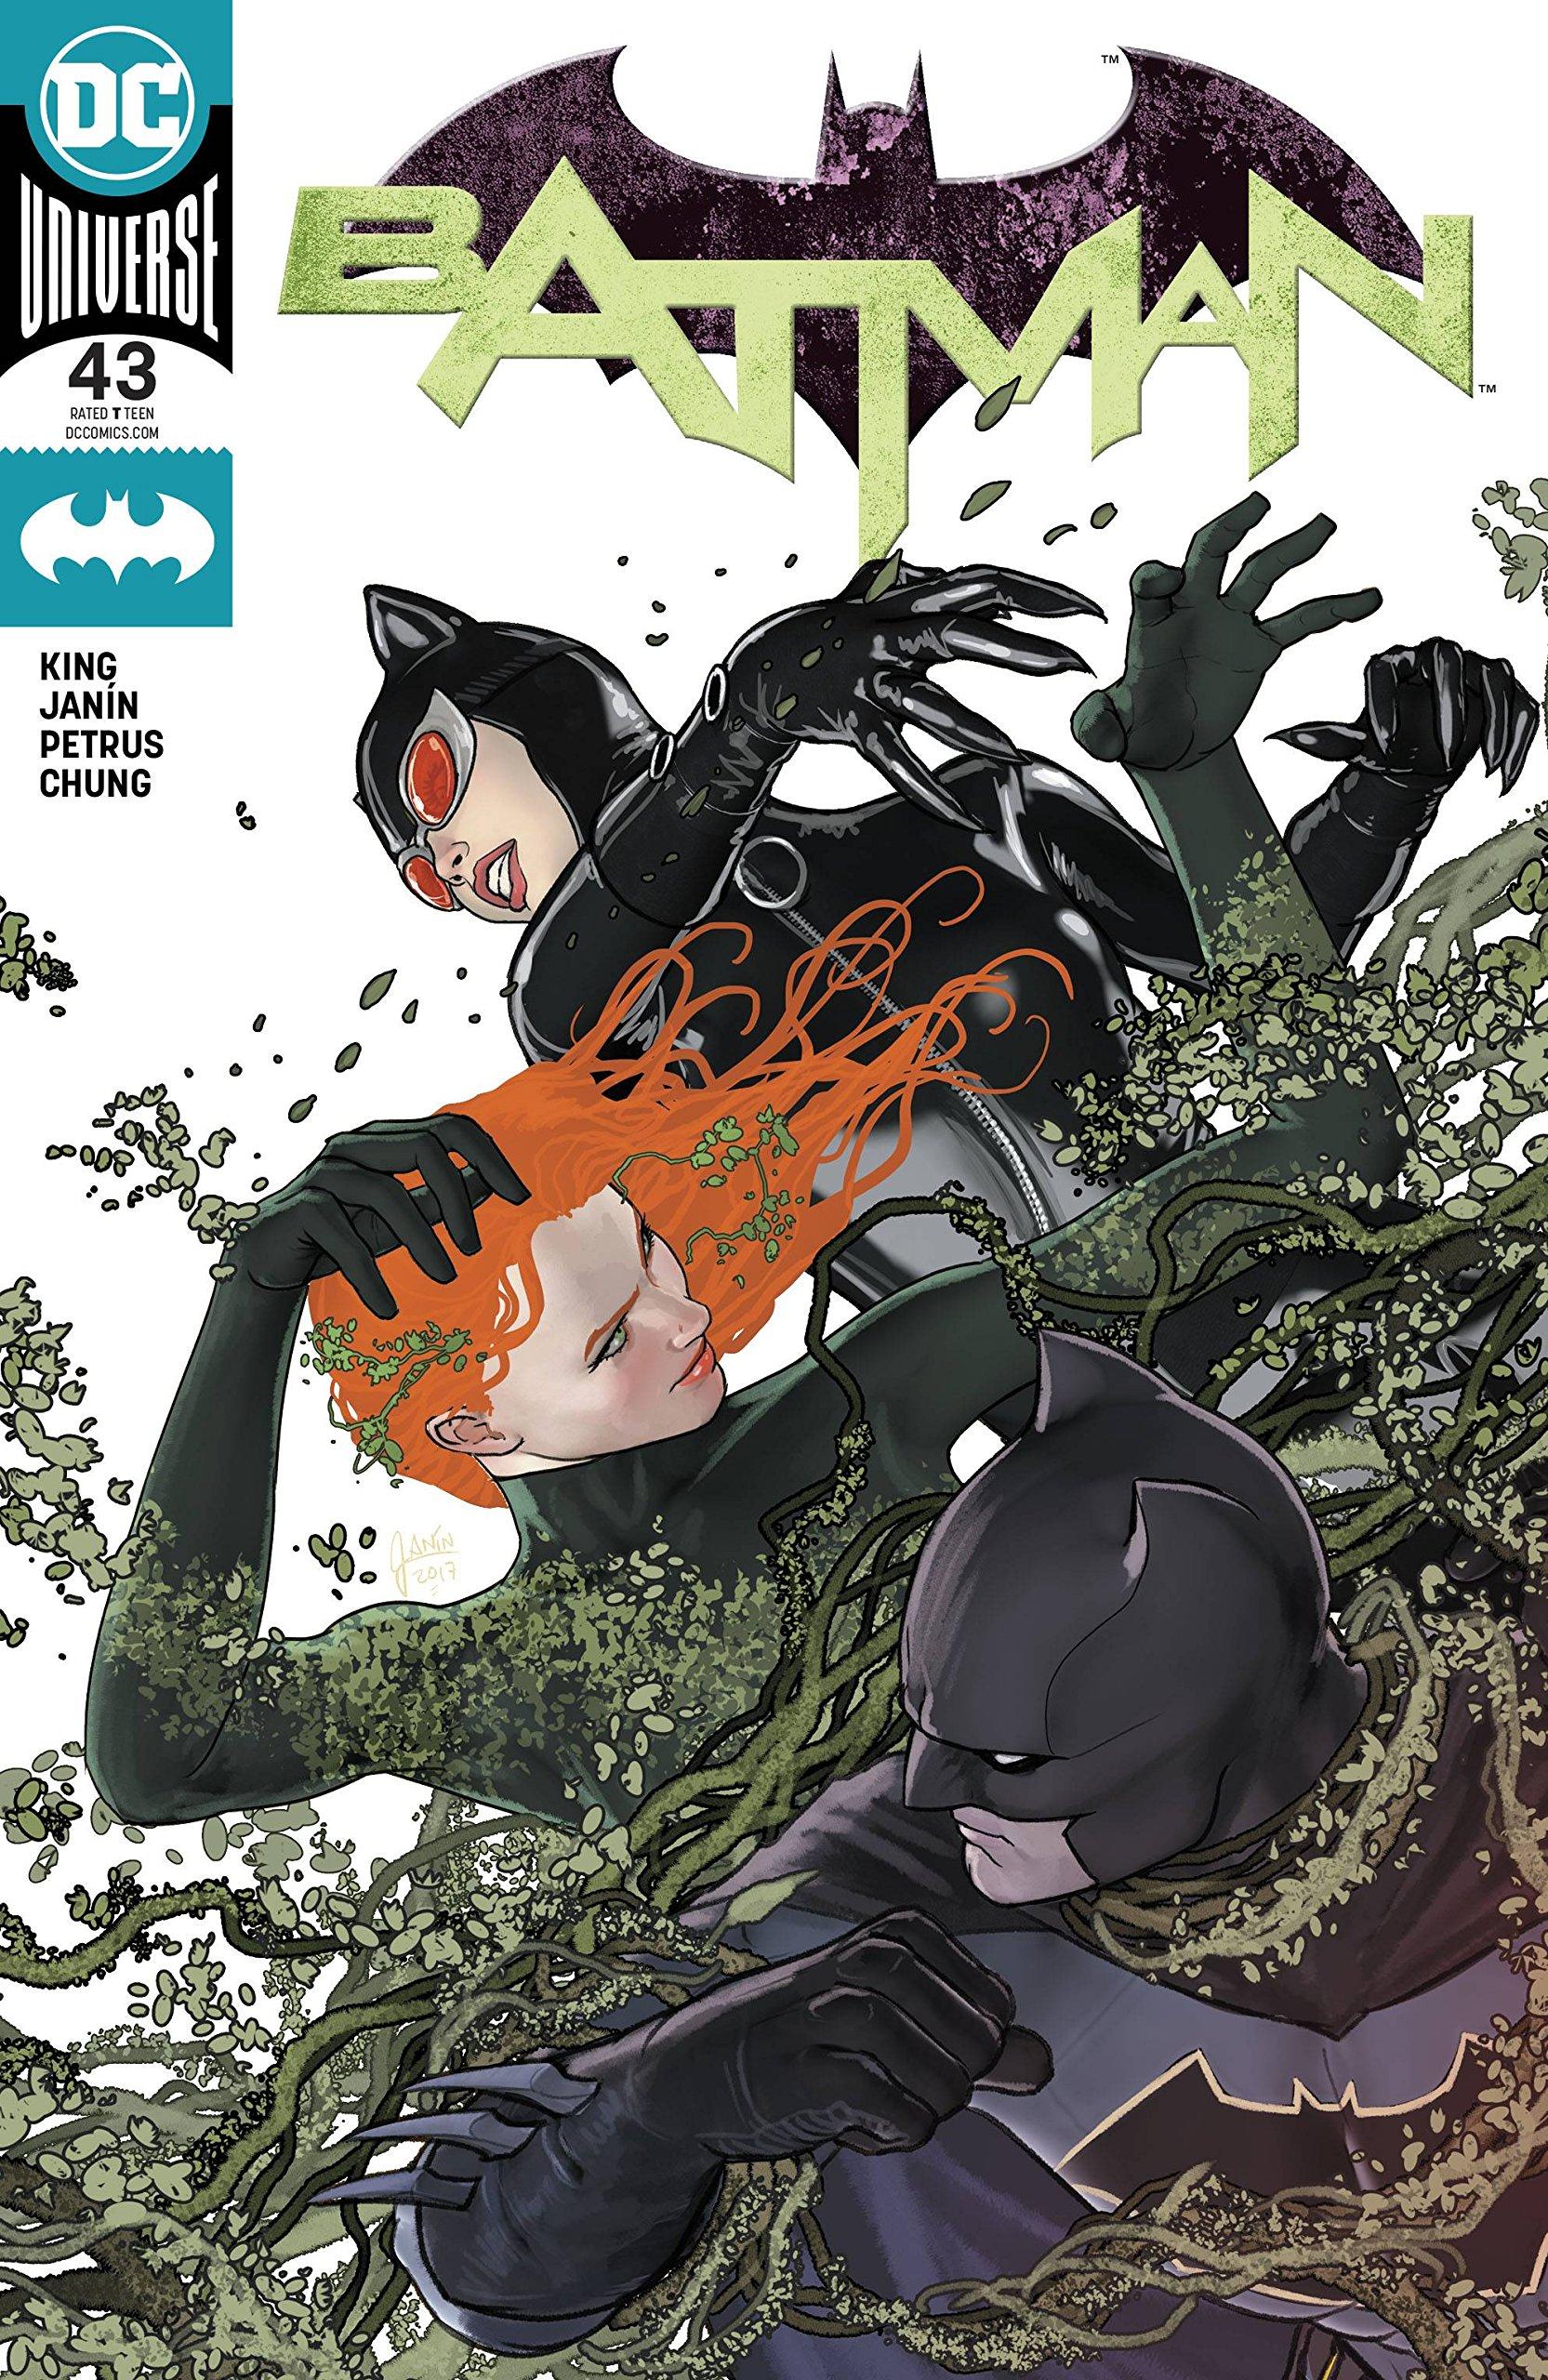 Read Online BATMAN #43 PDF